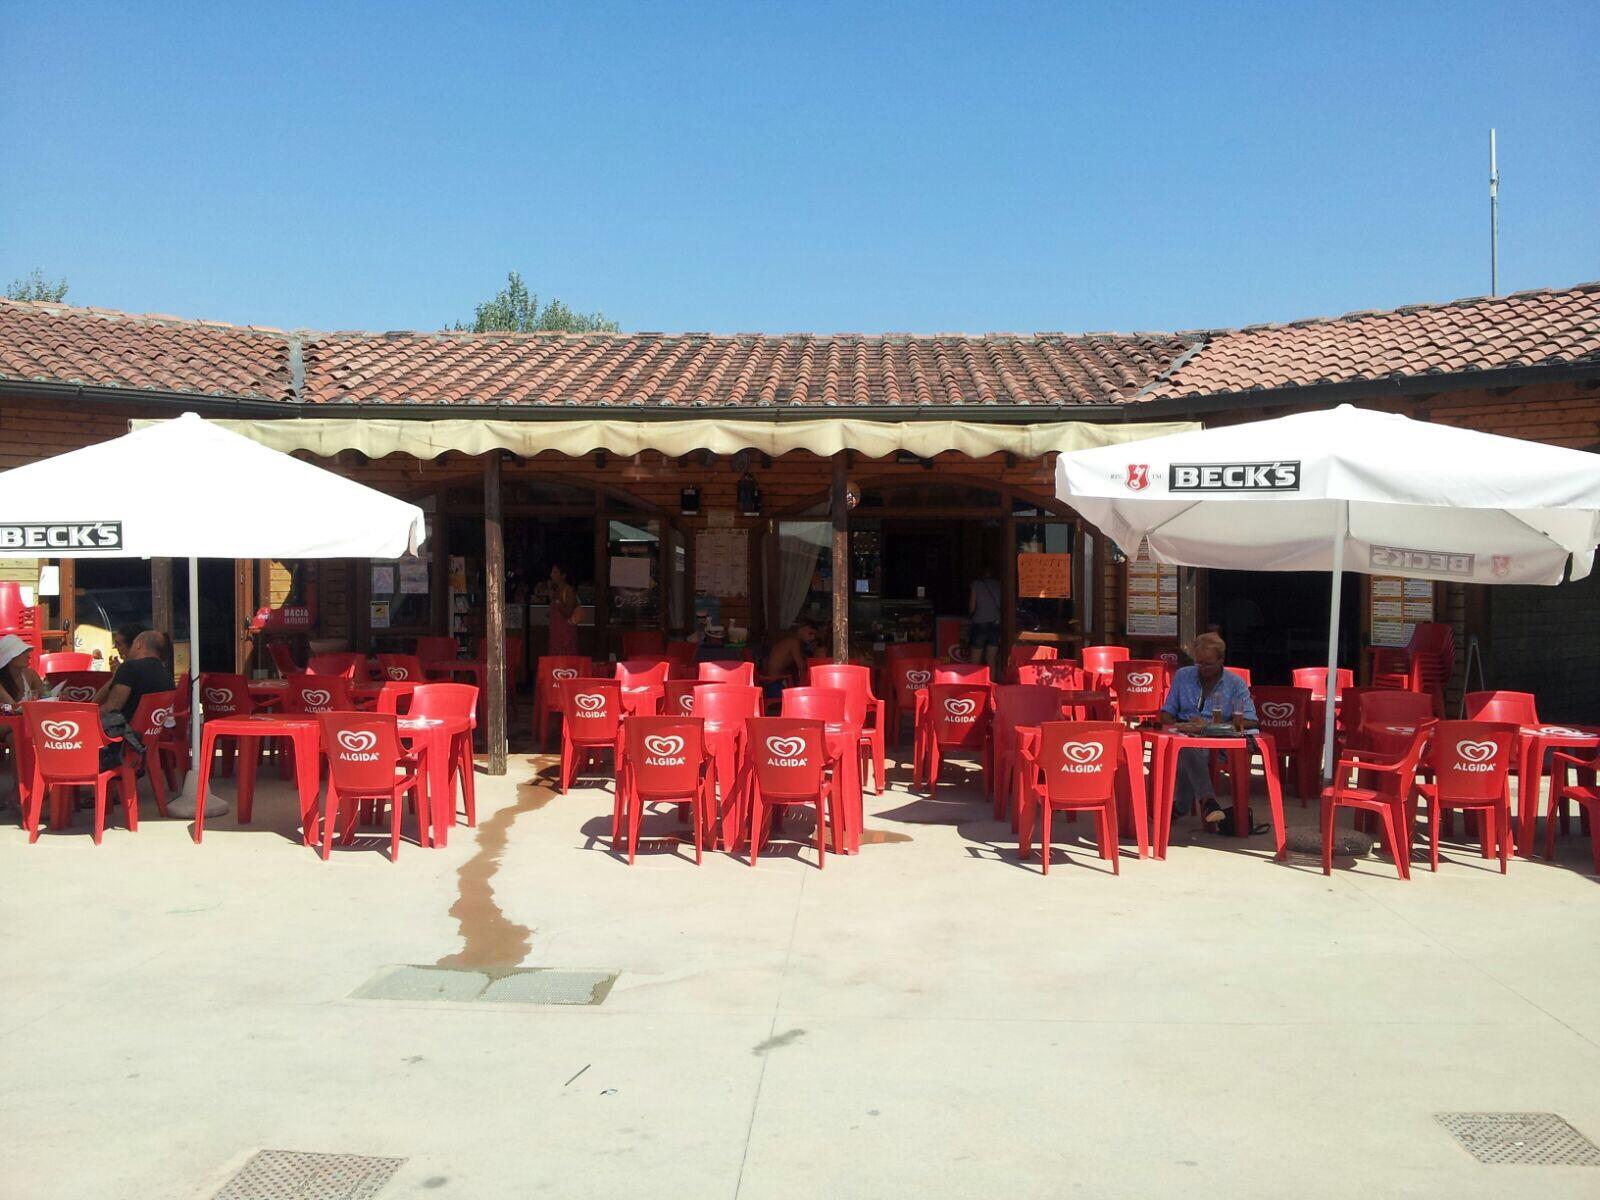 Camping viareggio italie